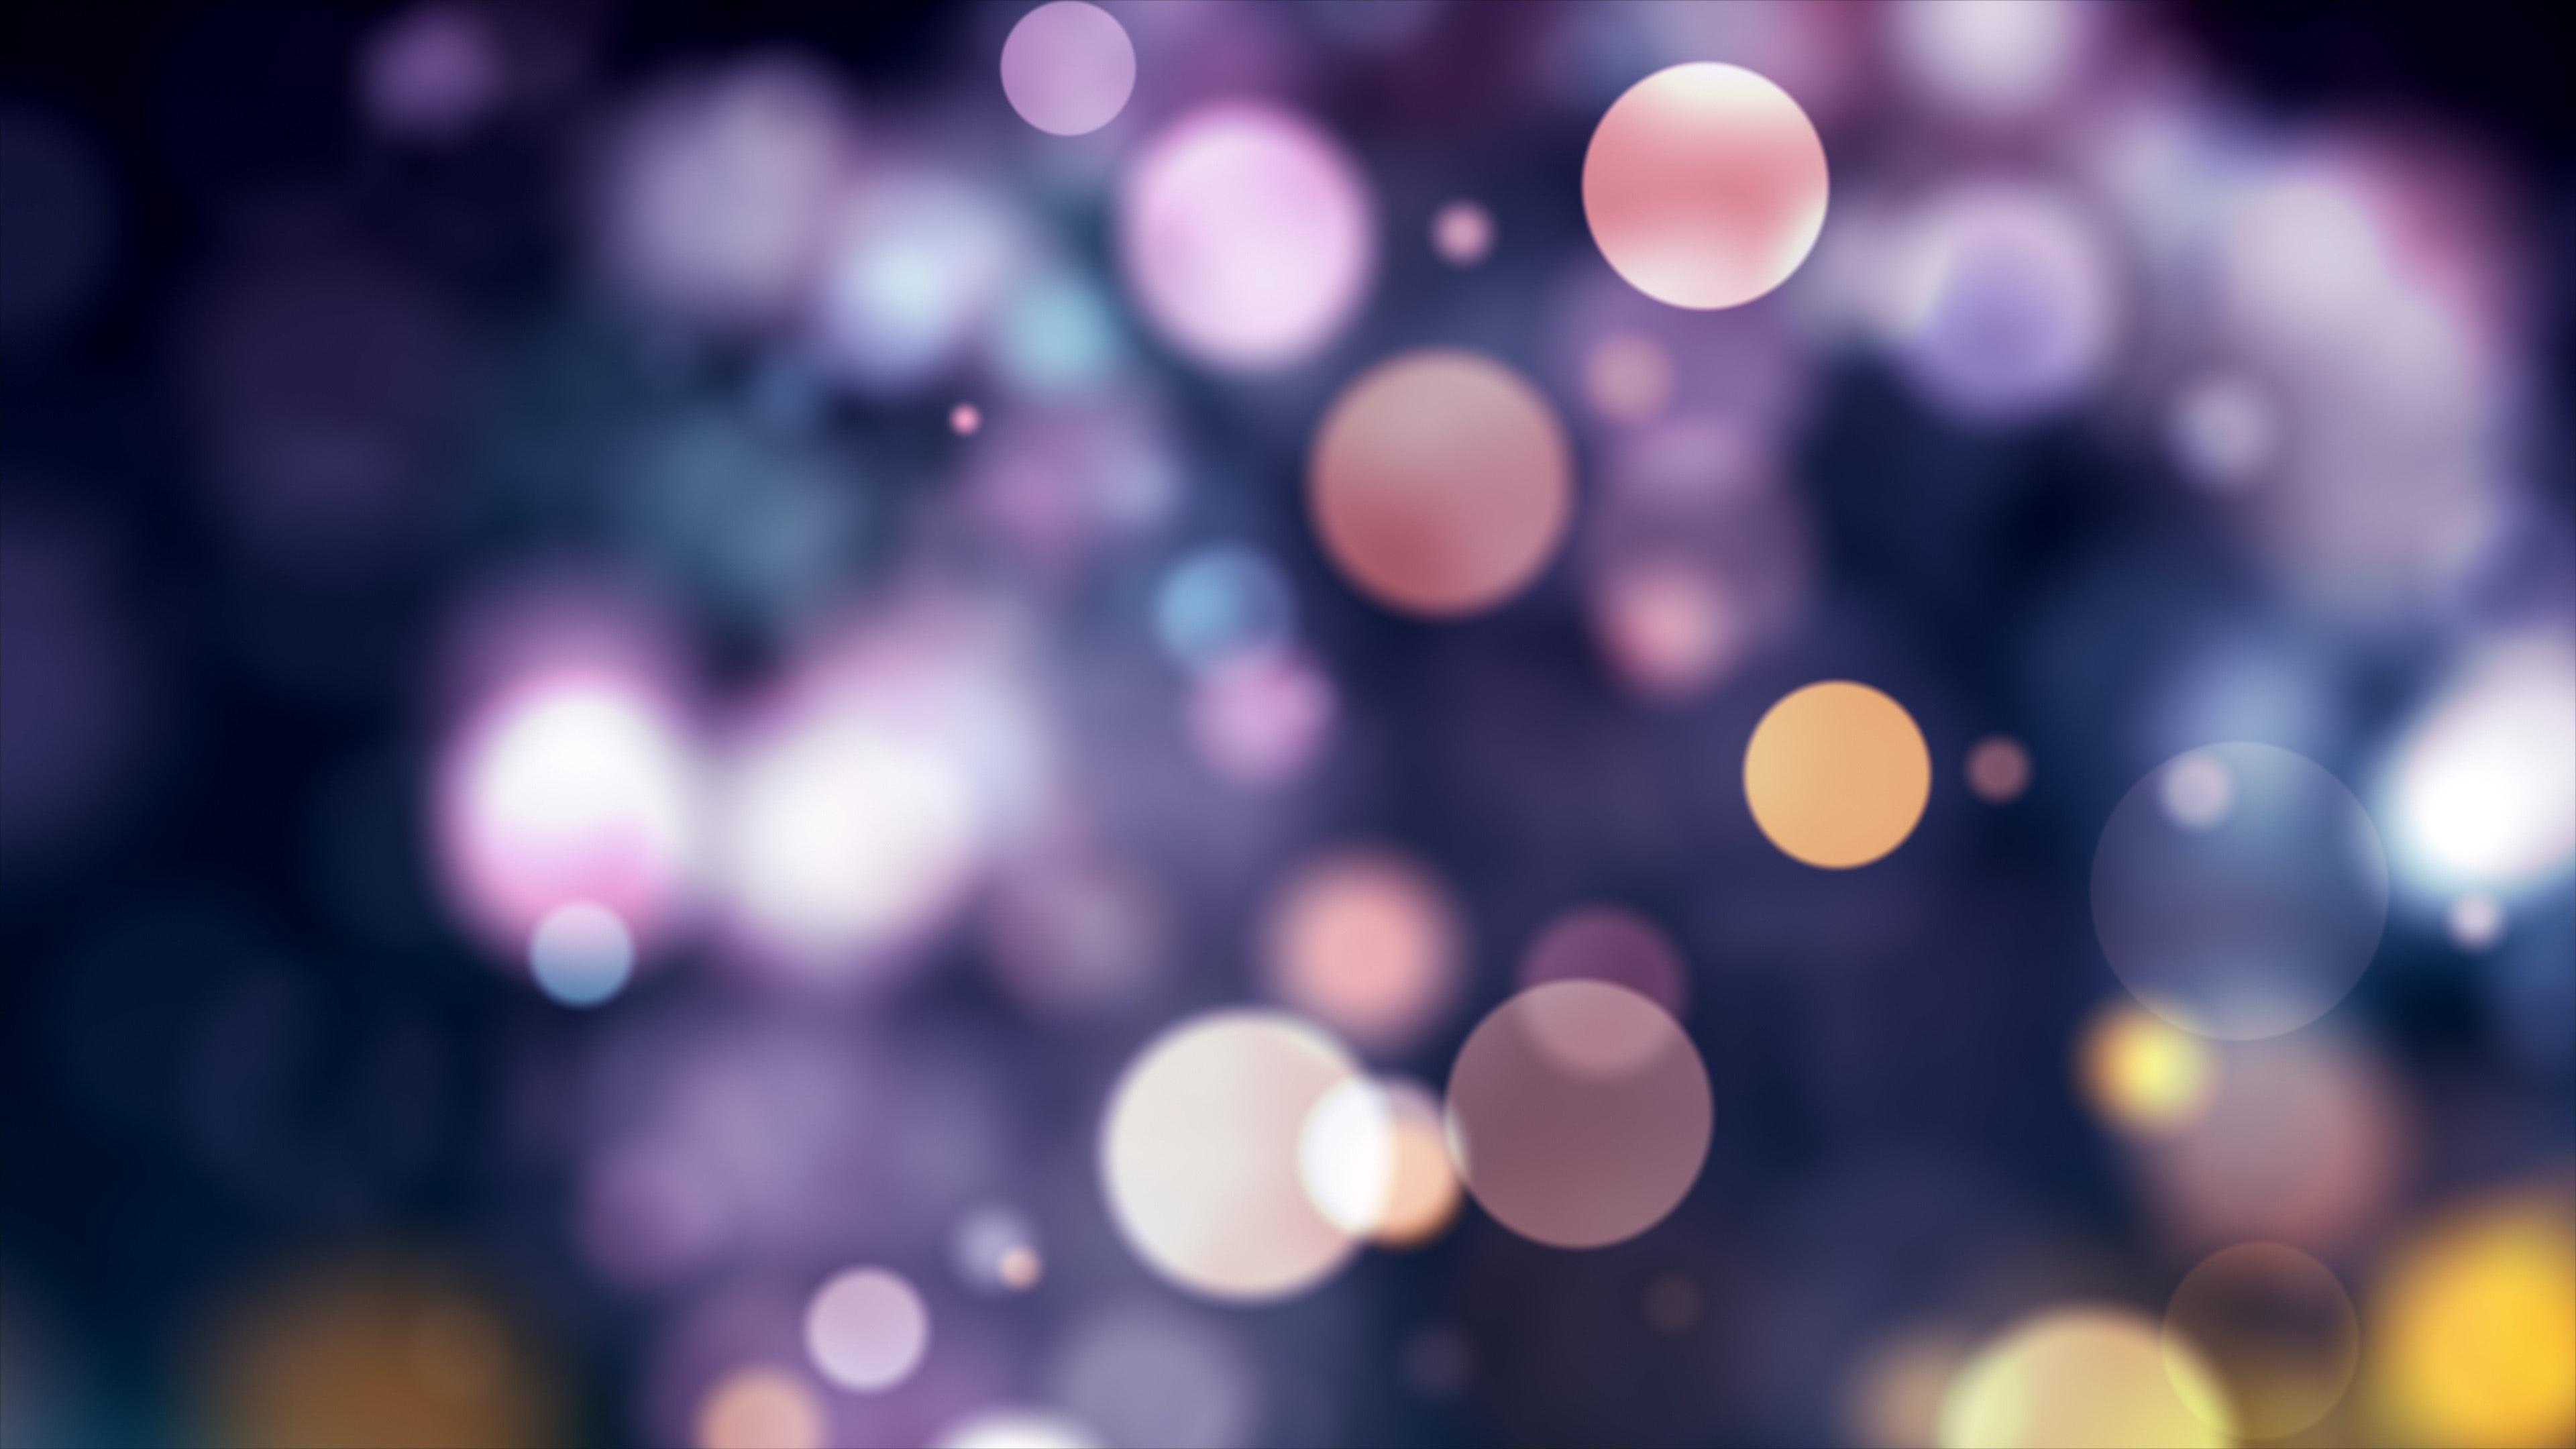 1000+ beautiful hd background photos · pexels · free stock photos